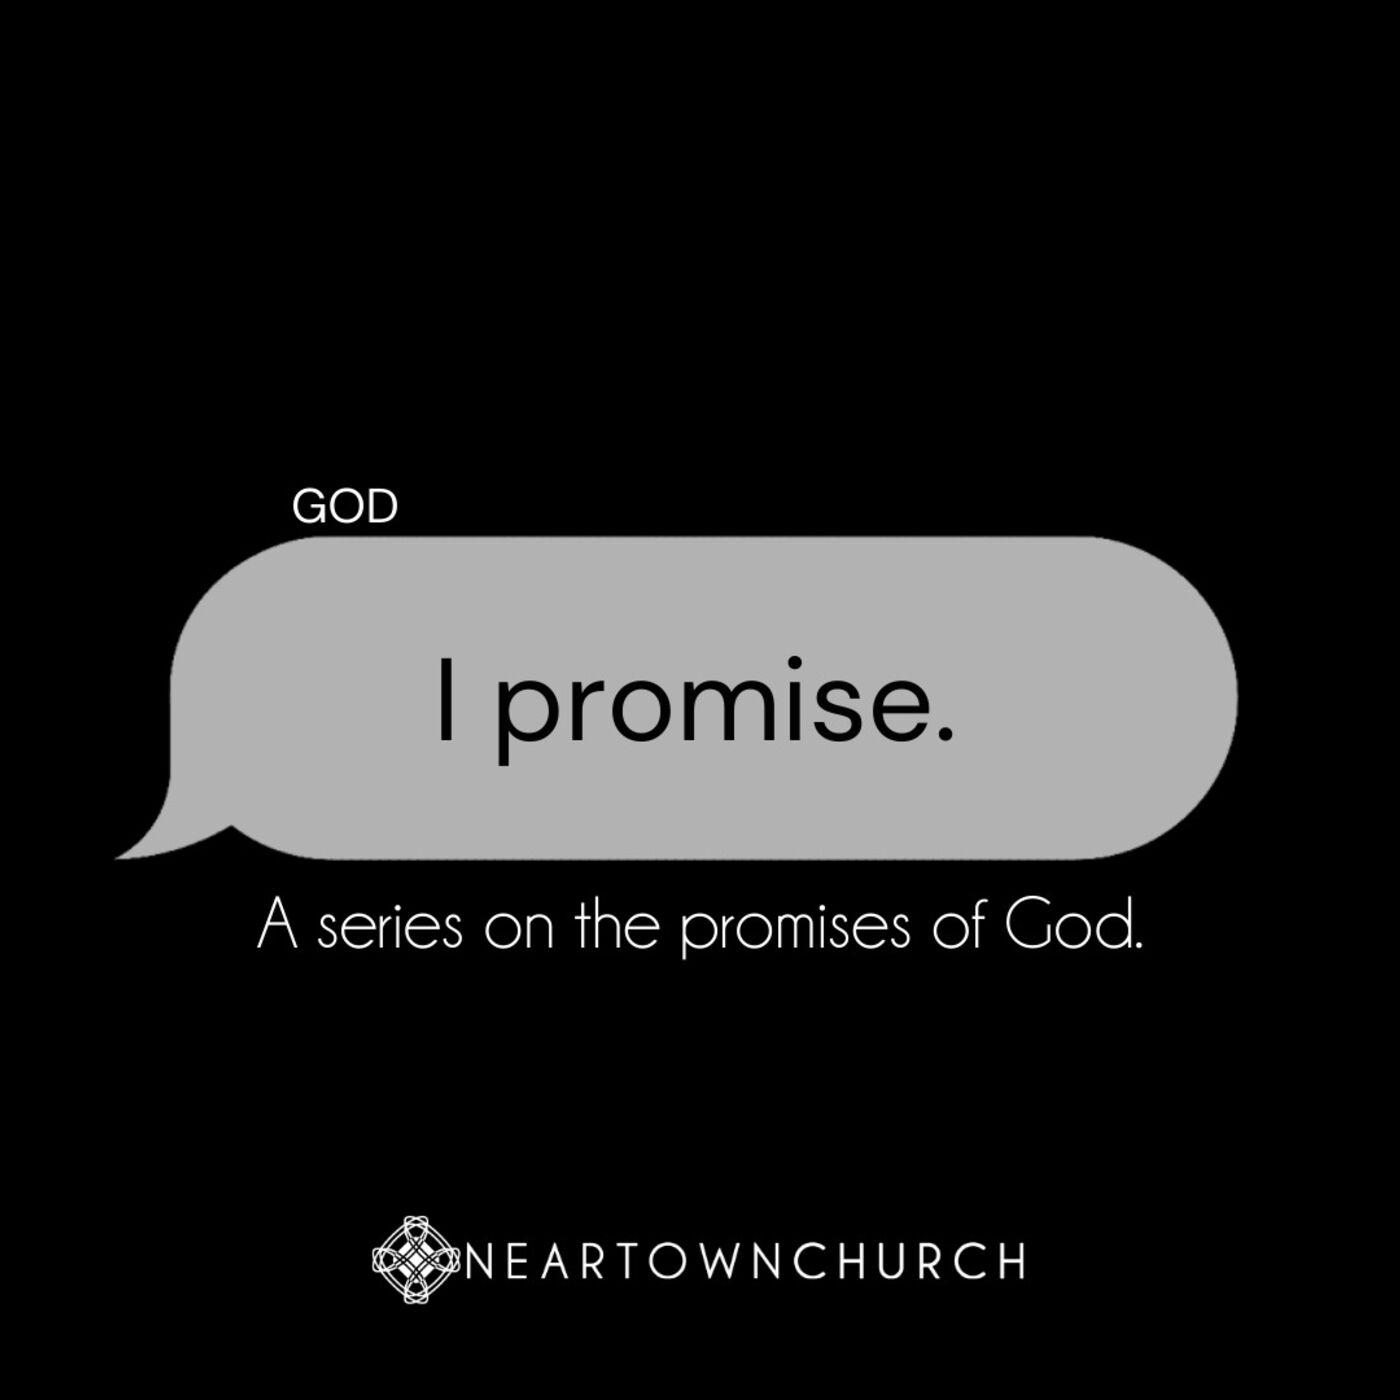 I promise. - 9.13.2020